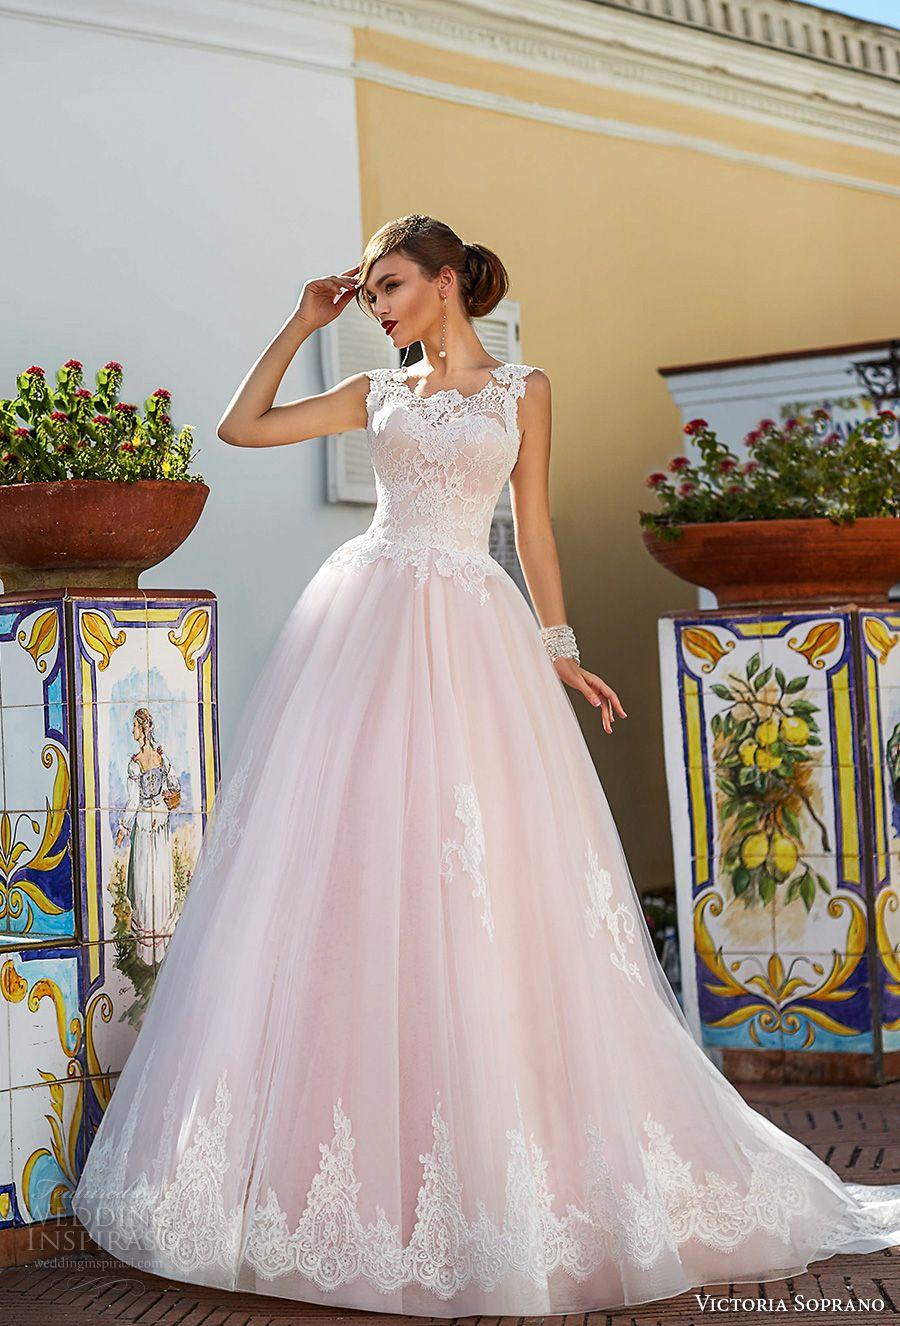 Victoria Soprano 2017 Wedding Dresses Capri Bridal Collection Wedding Inspirasi Pink Wedding Dresses Trendy Wedding Dresses Bridal Dresses [ 1326 x 900 Pixel ]